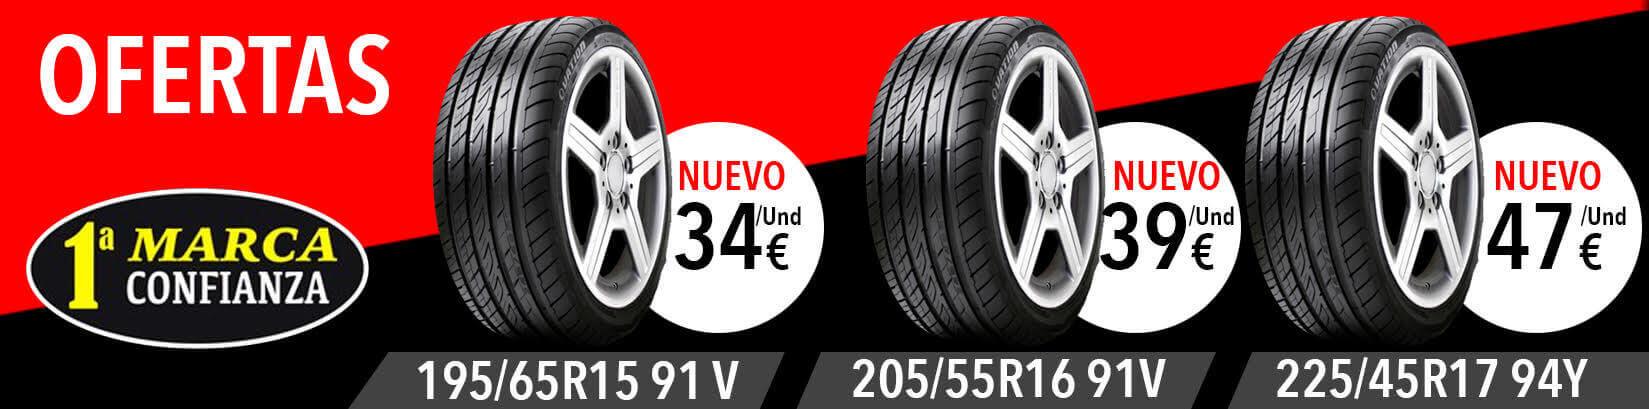 marcas de confianza de neumáticos